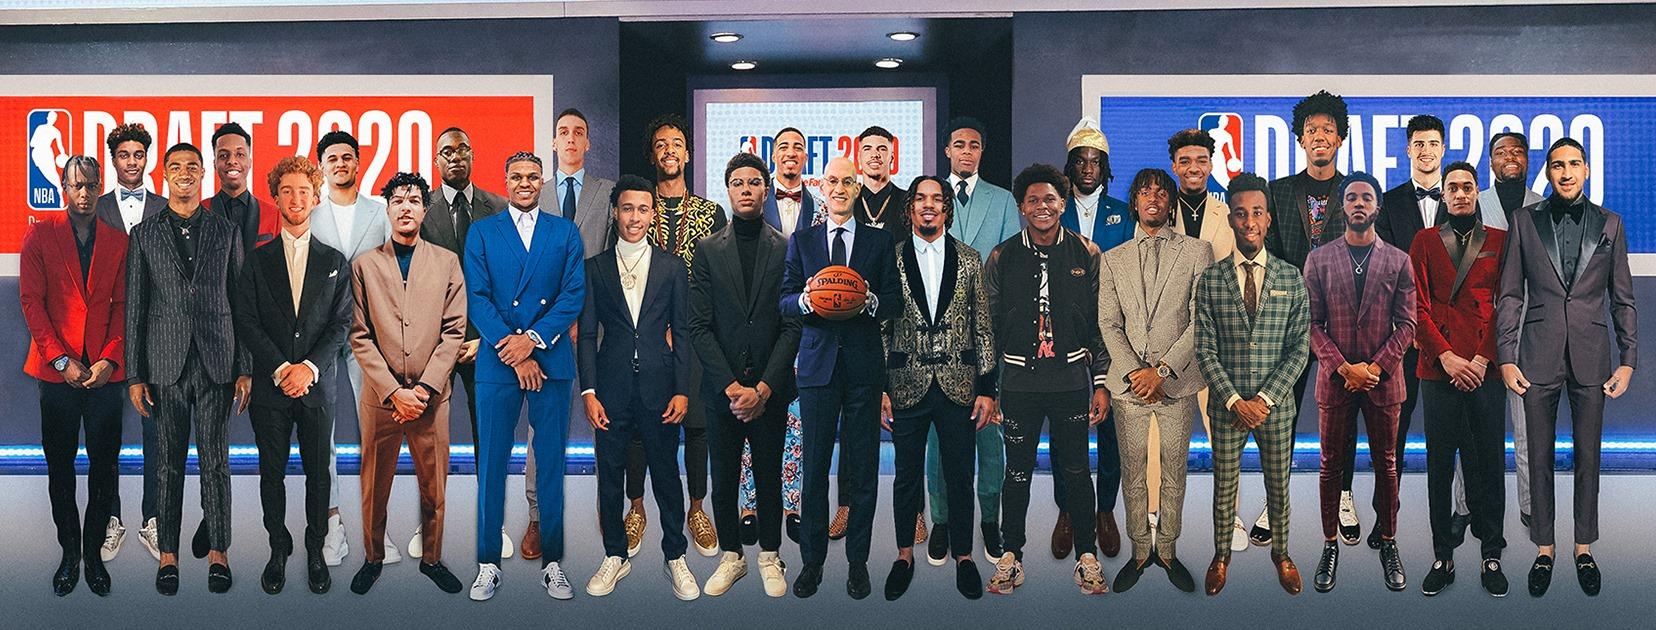 Foto di rito NBA Draft 2020